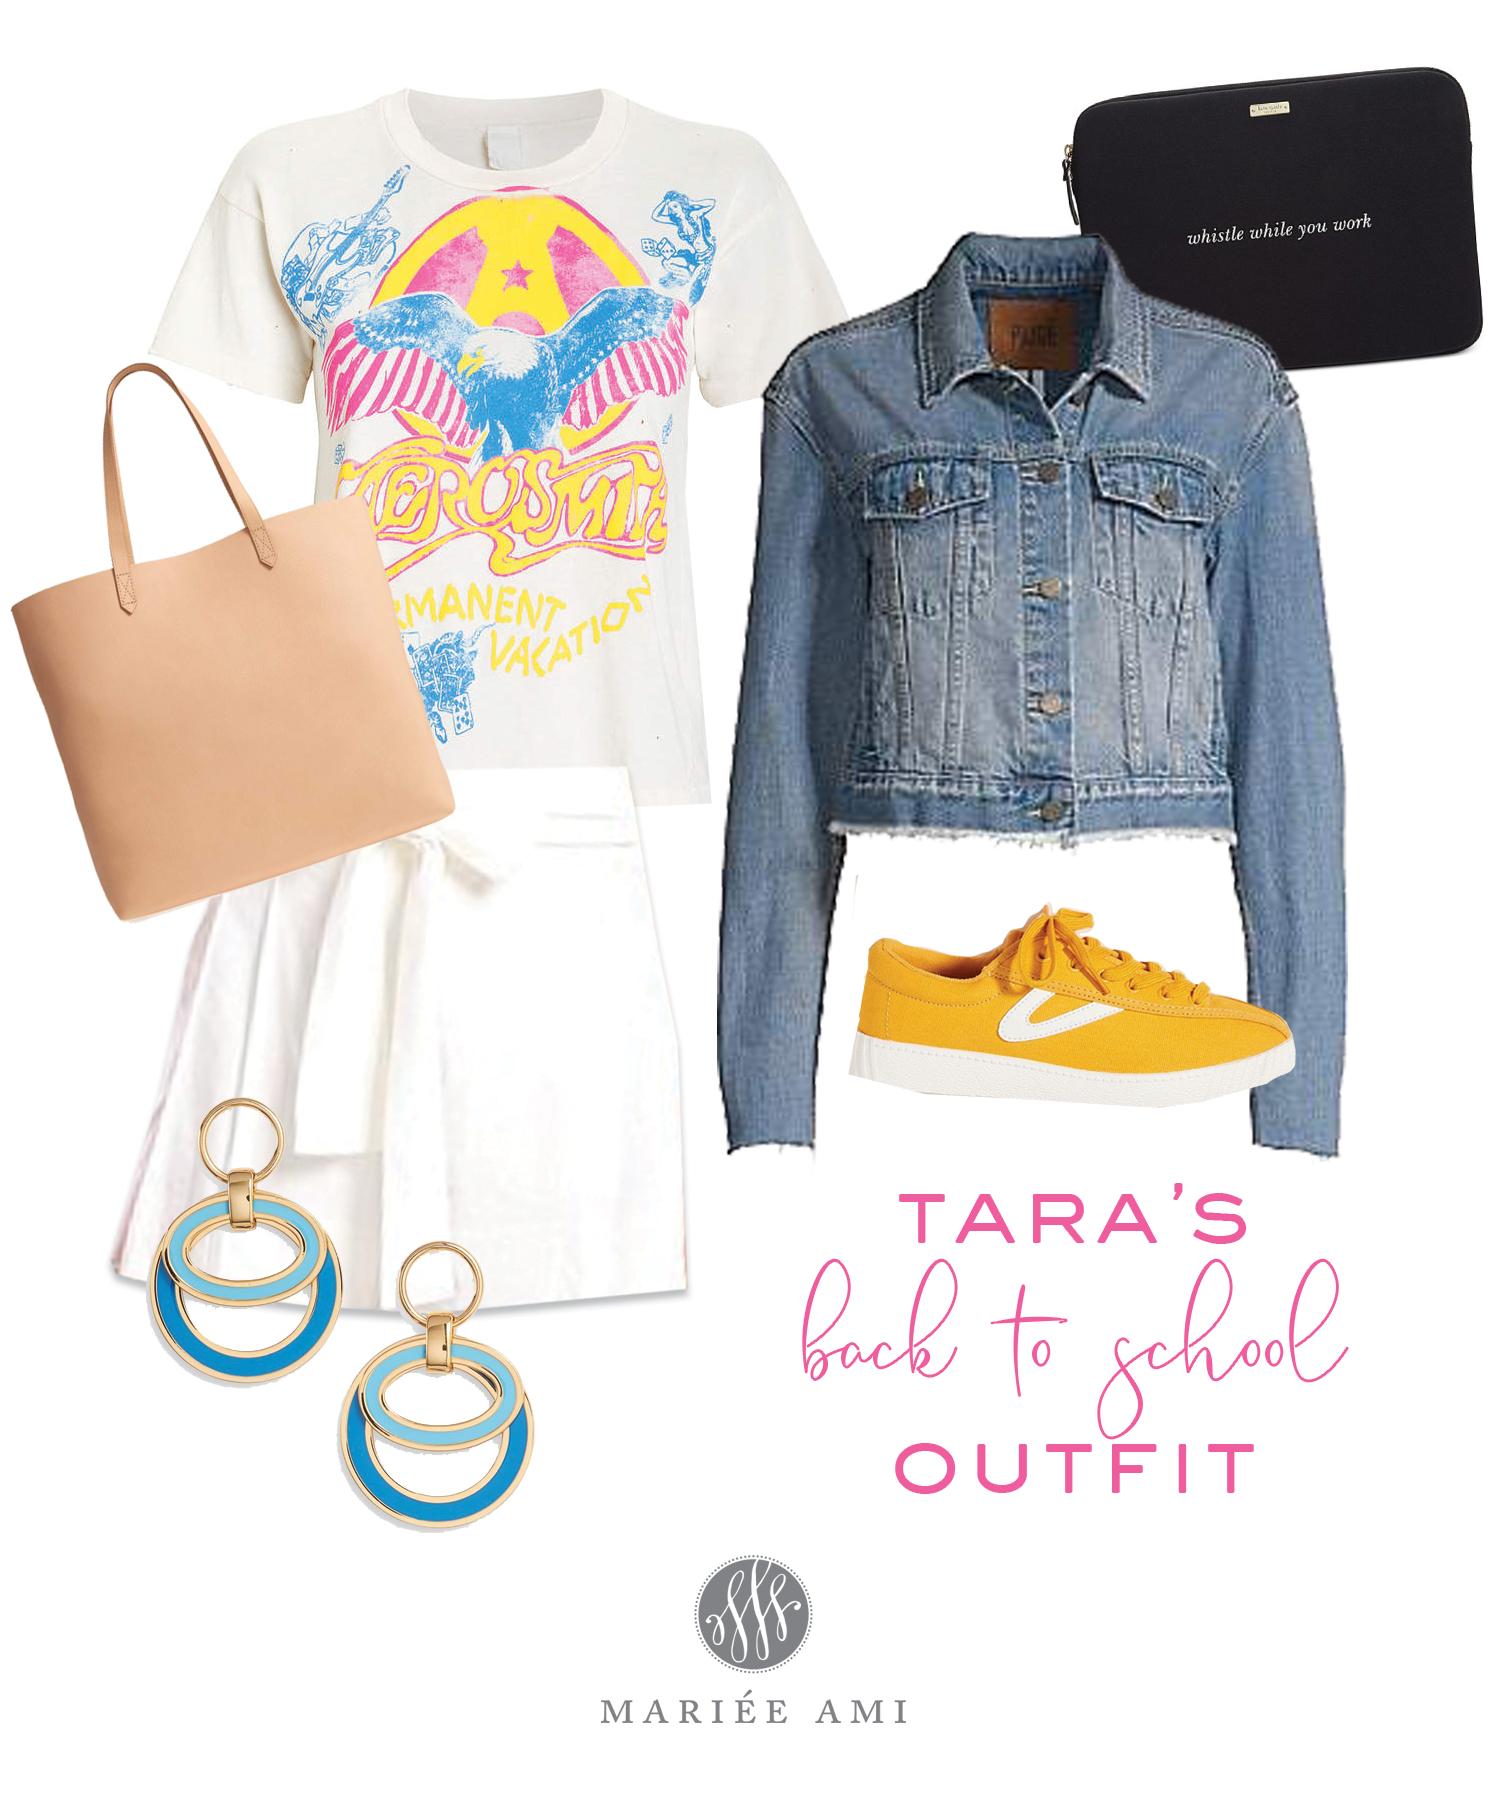 Tara's OUTFIT.jpg